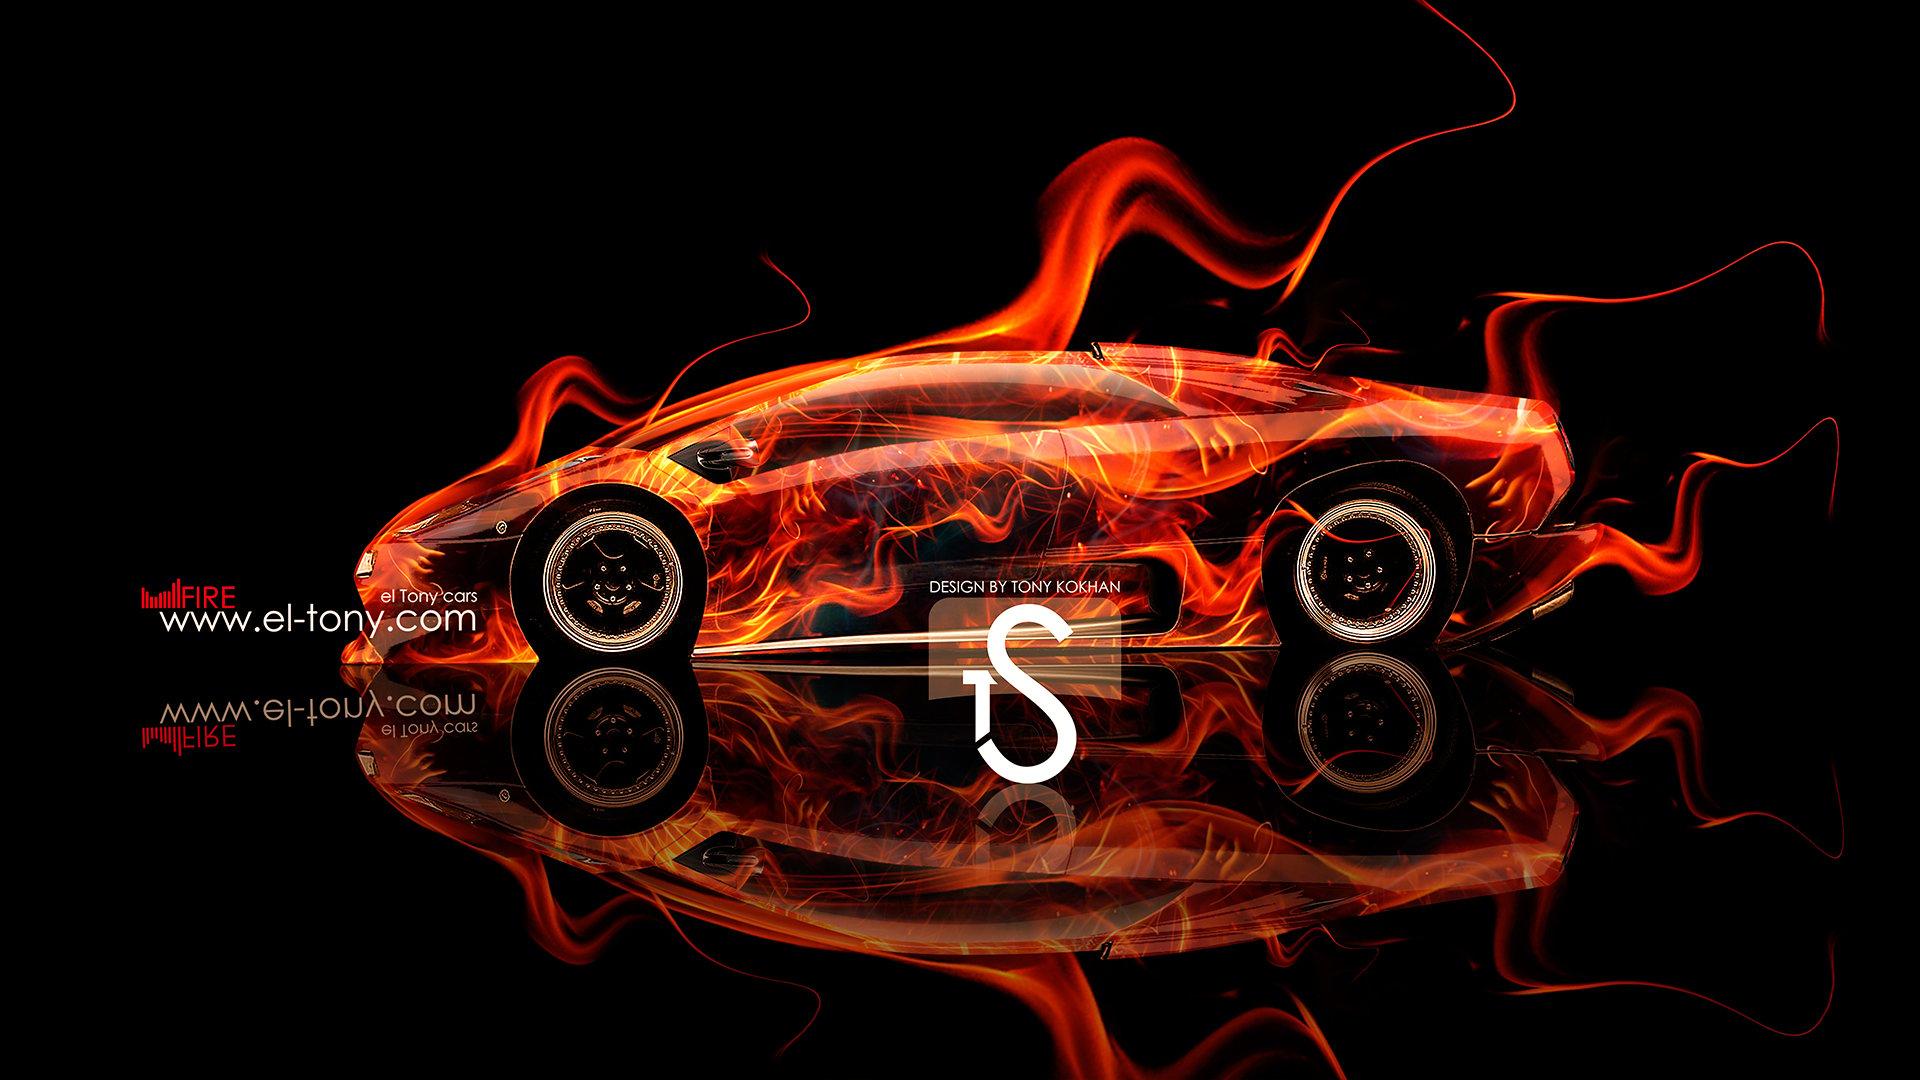 U003cbu003eFerrari Enzo Side Fireu003c/bu003e Abstract Car 2014 Hd  Wallpapers